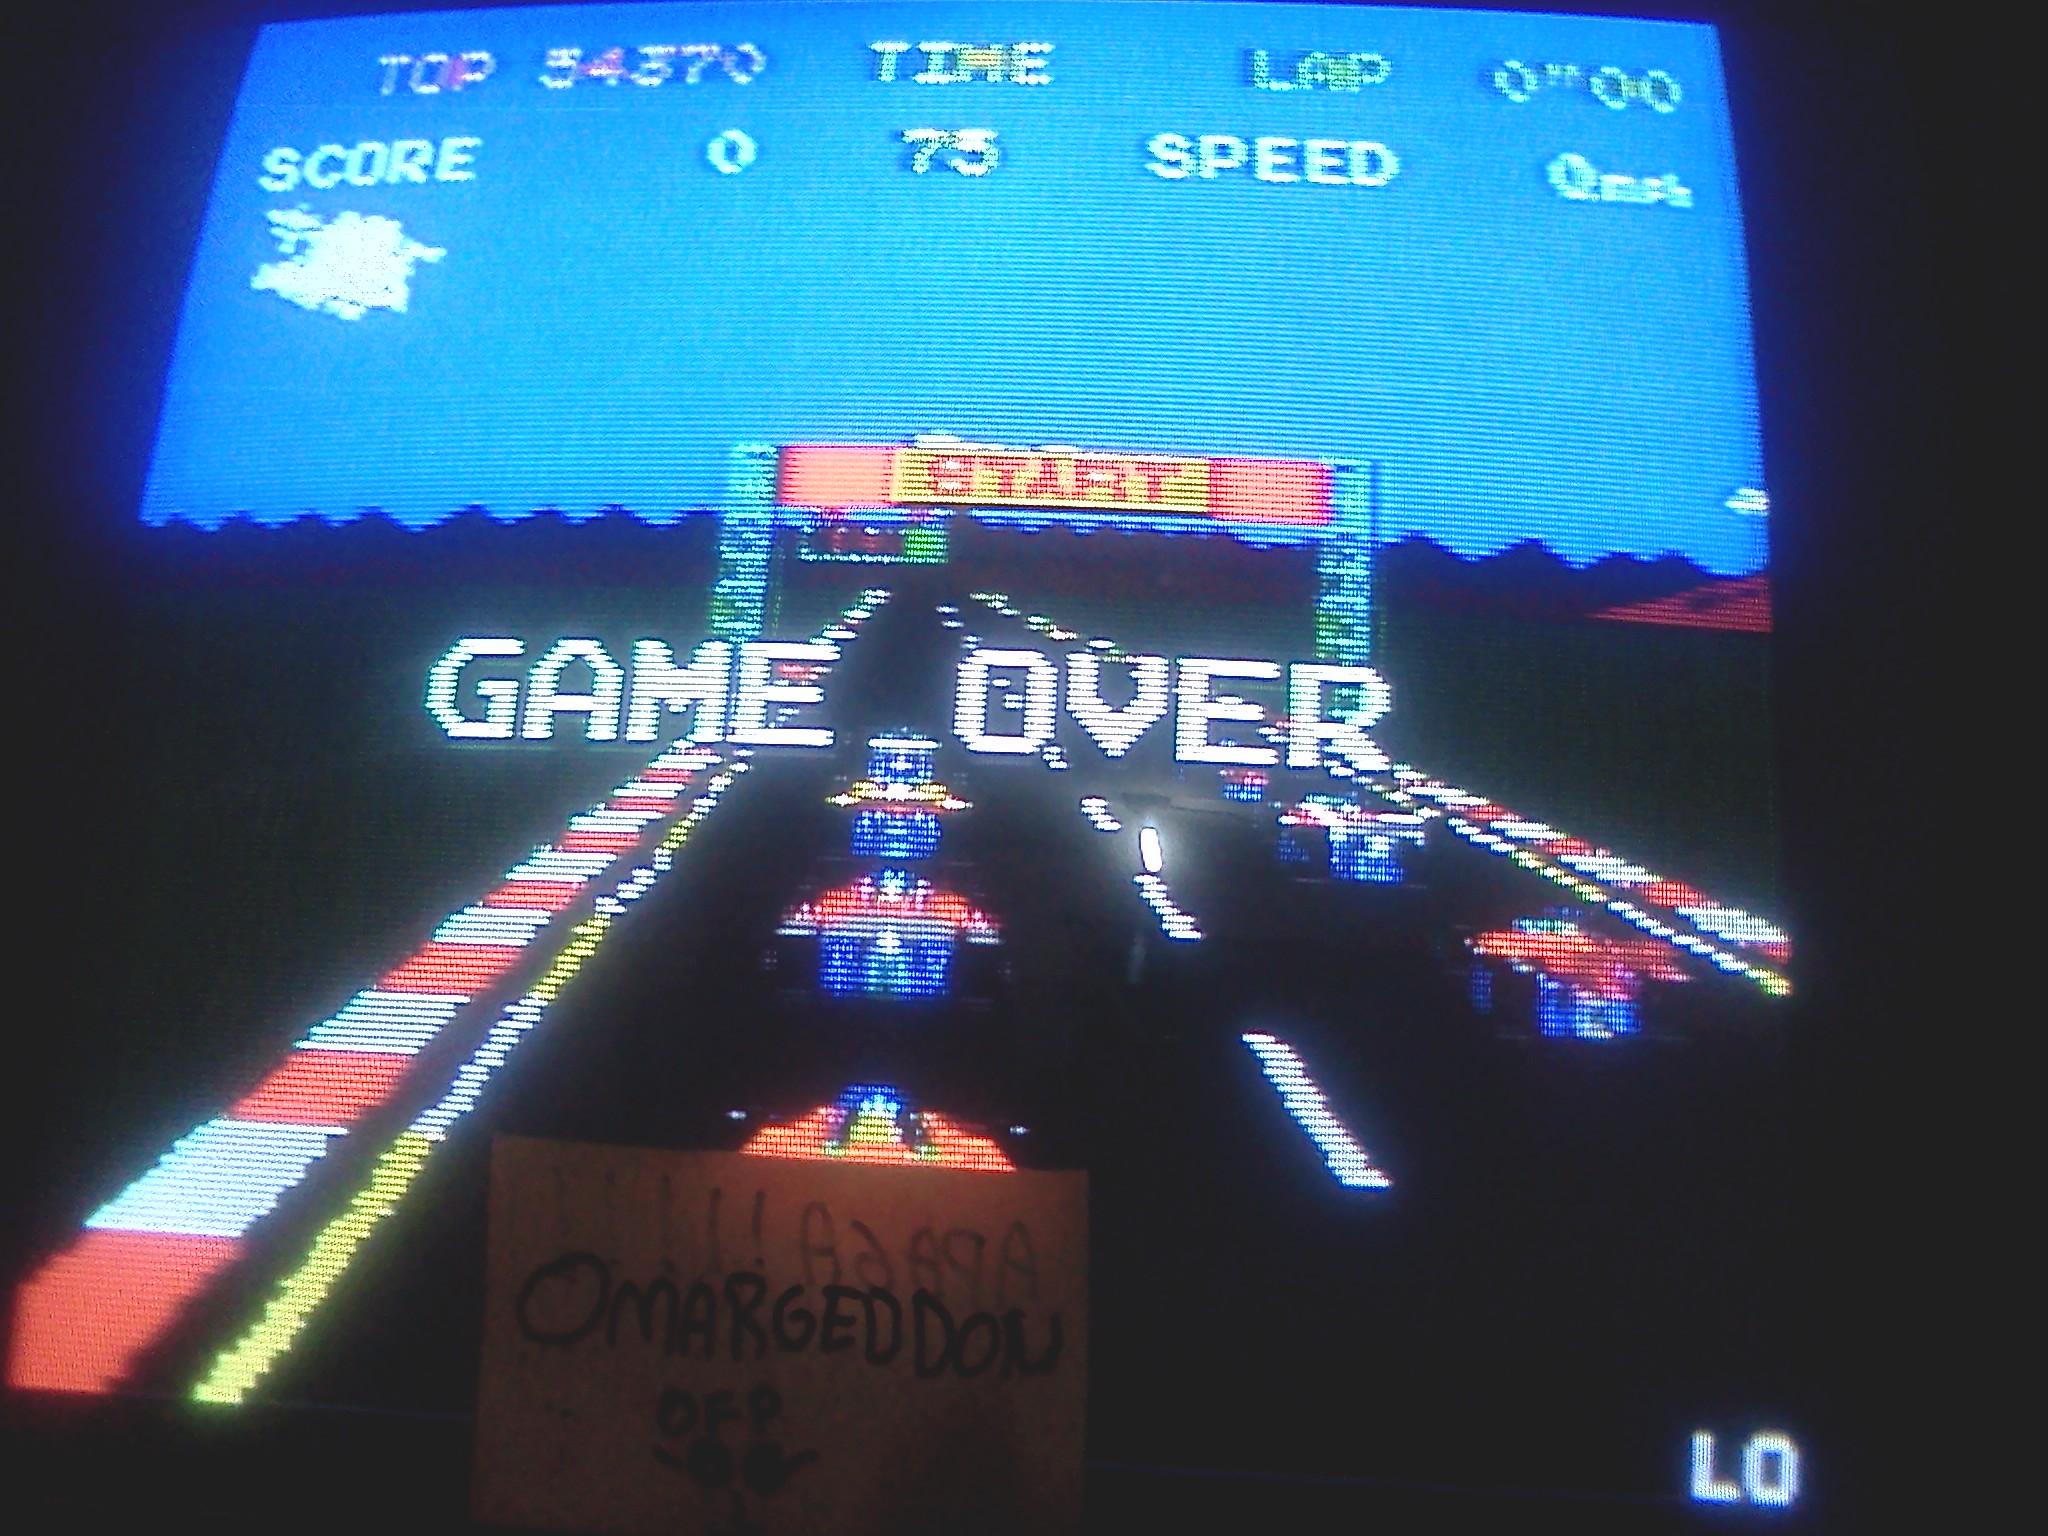 omargeddon: Pole Position (Jakks Pacific Retro Arcade Pac-Man) 54,370 points on 2016-07-23 23:24:45